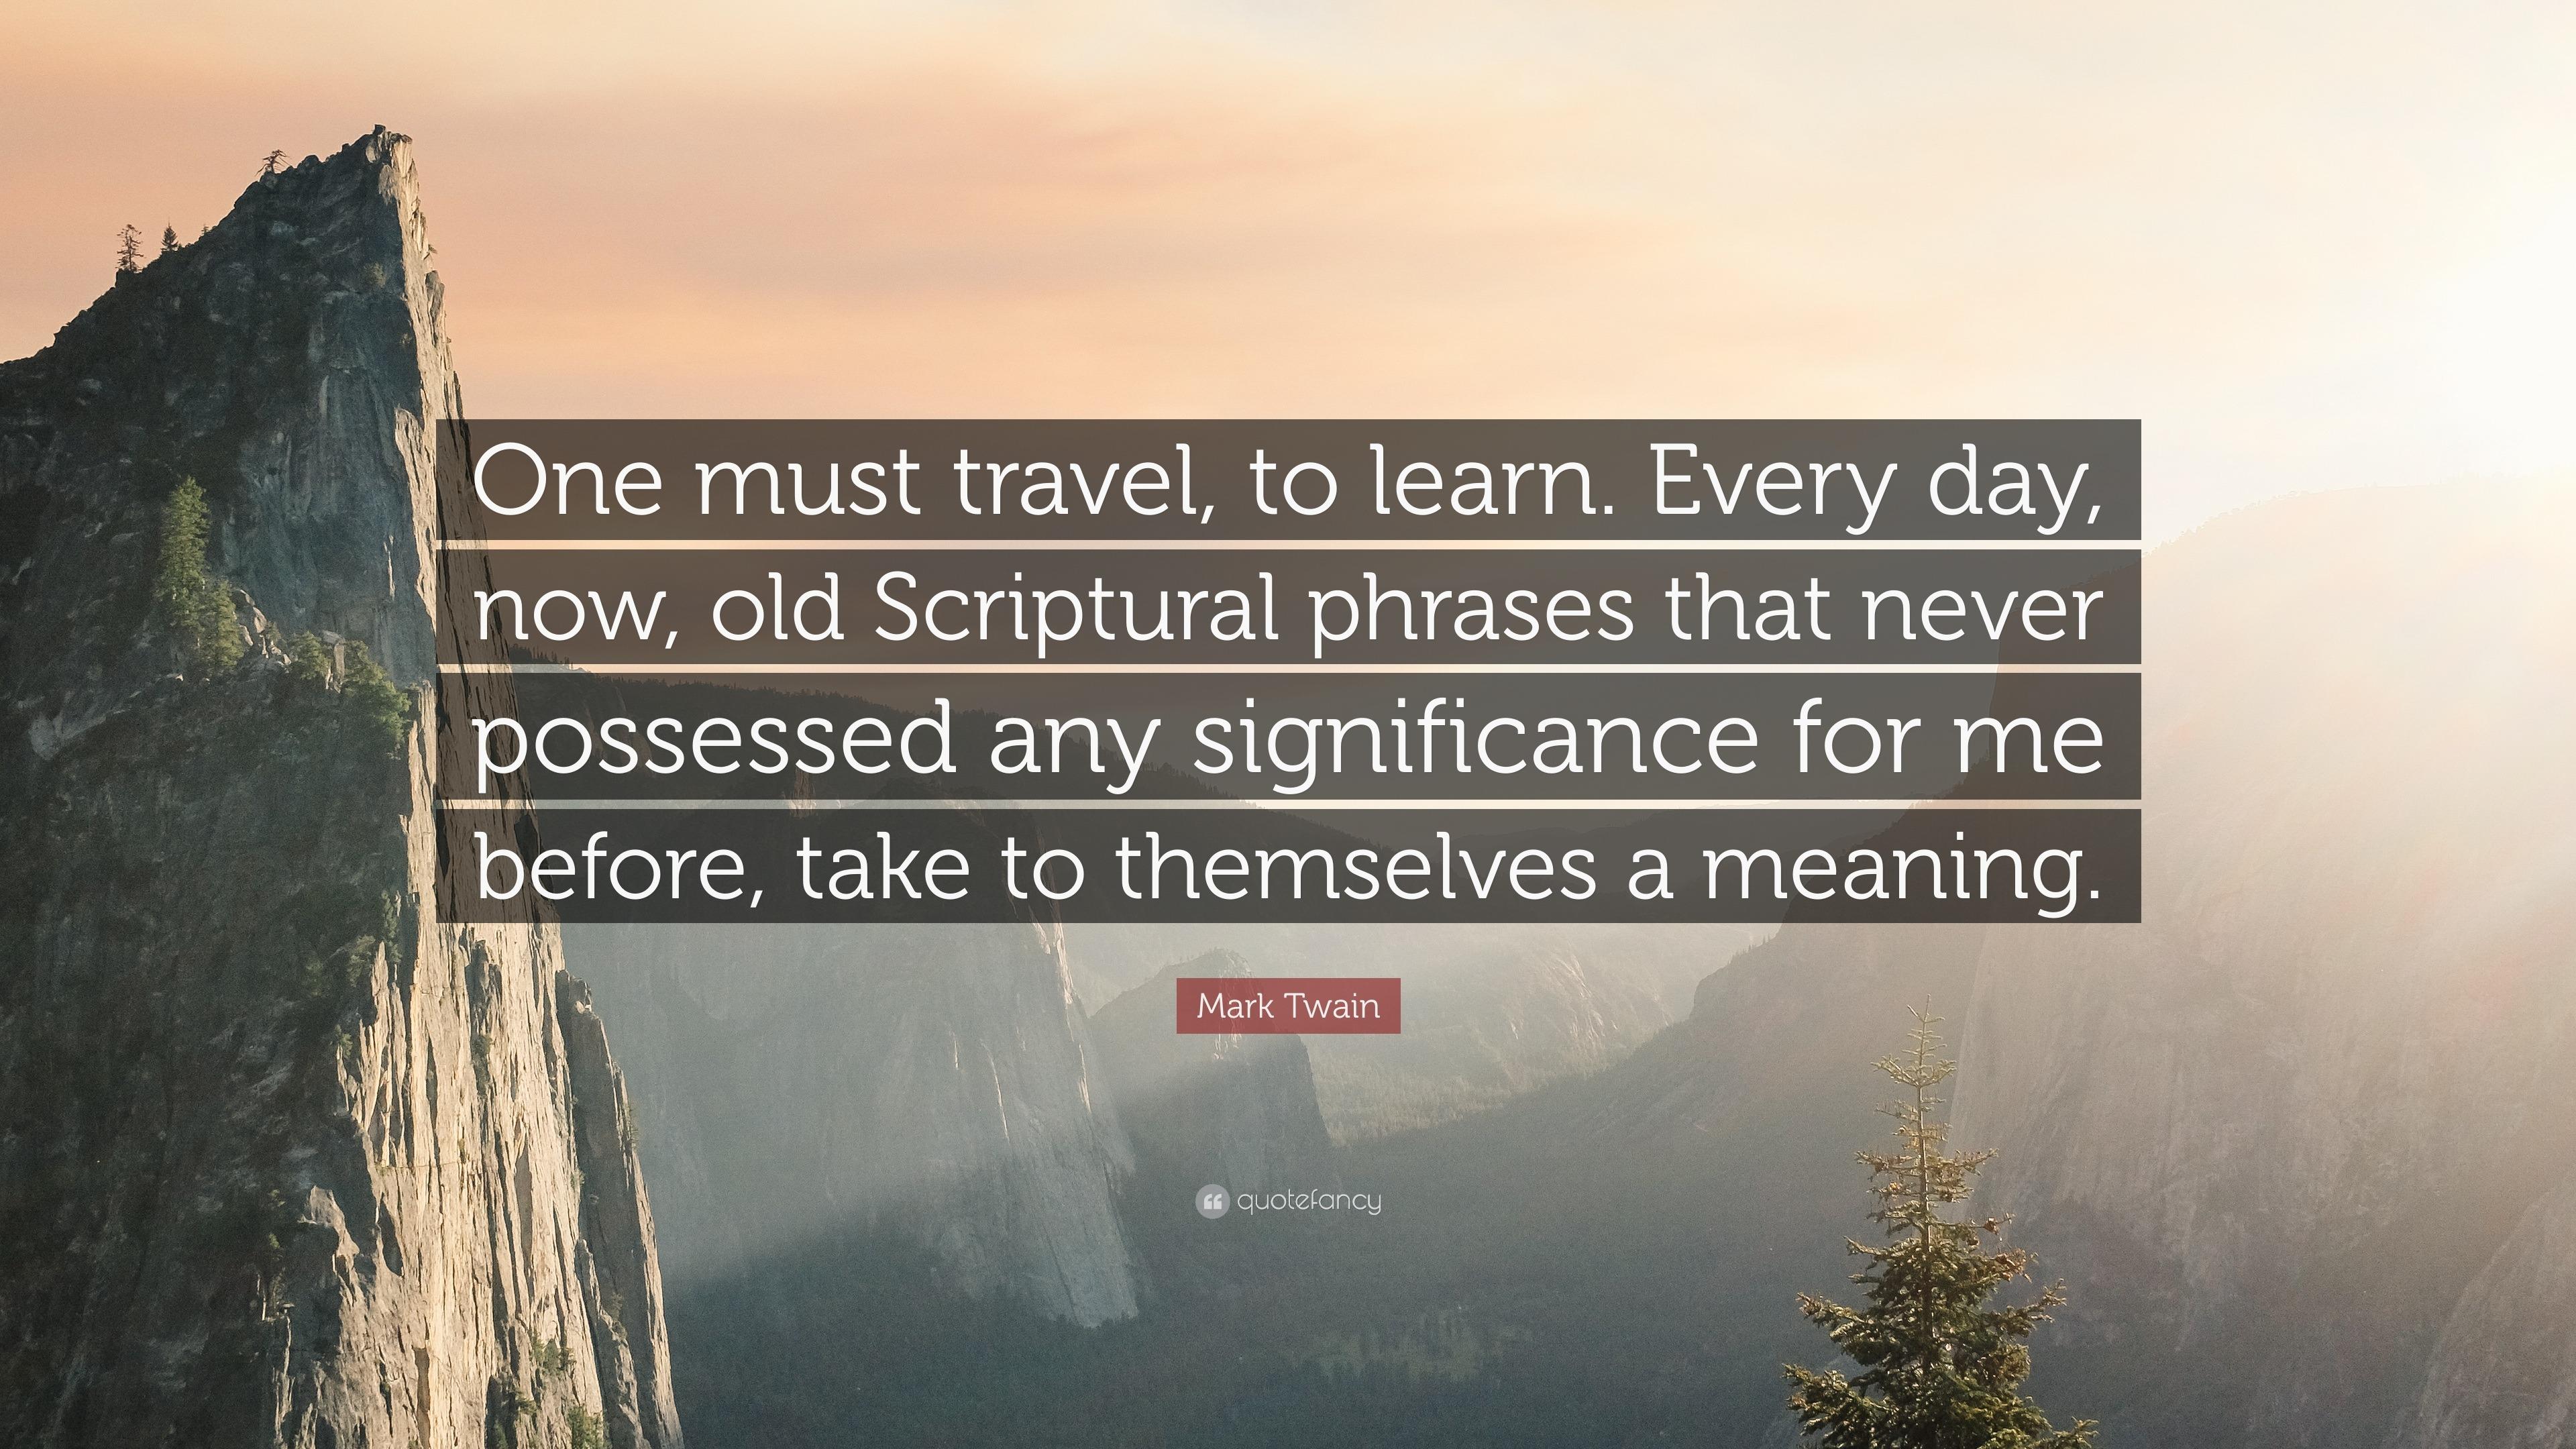 travel traveler and mark twain